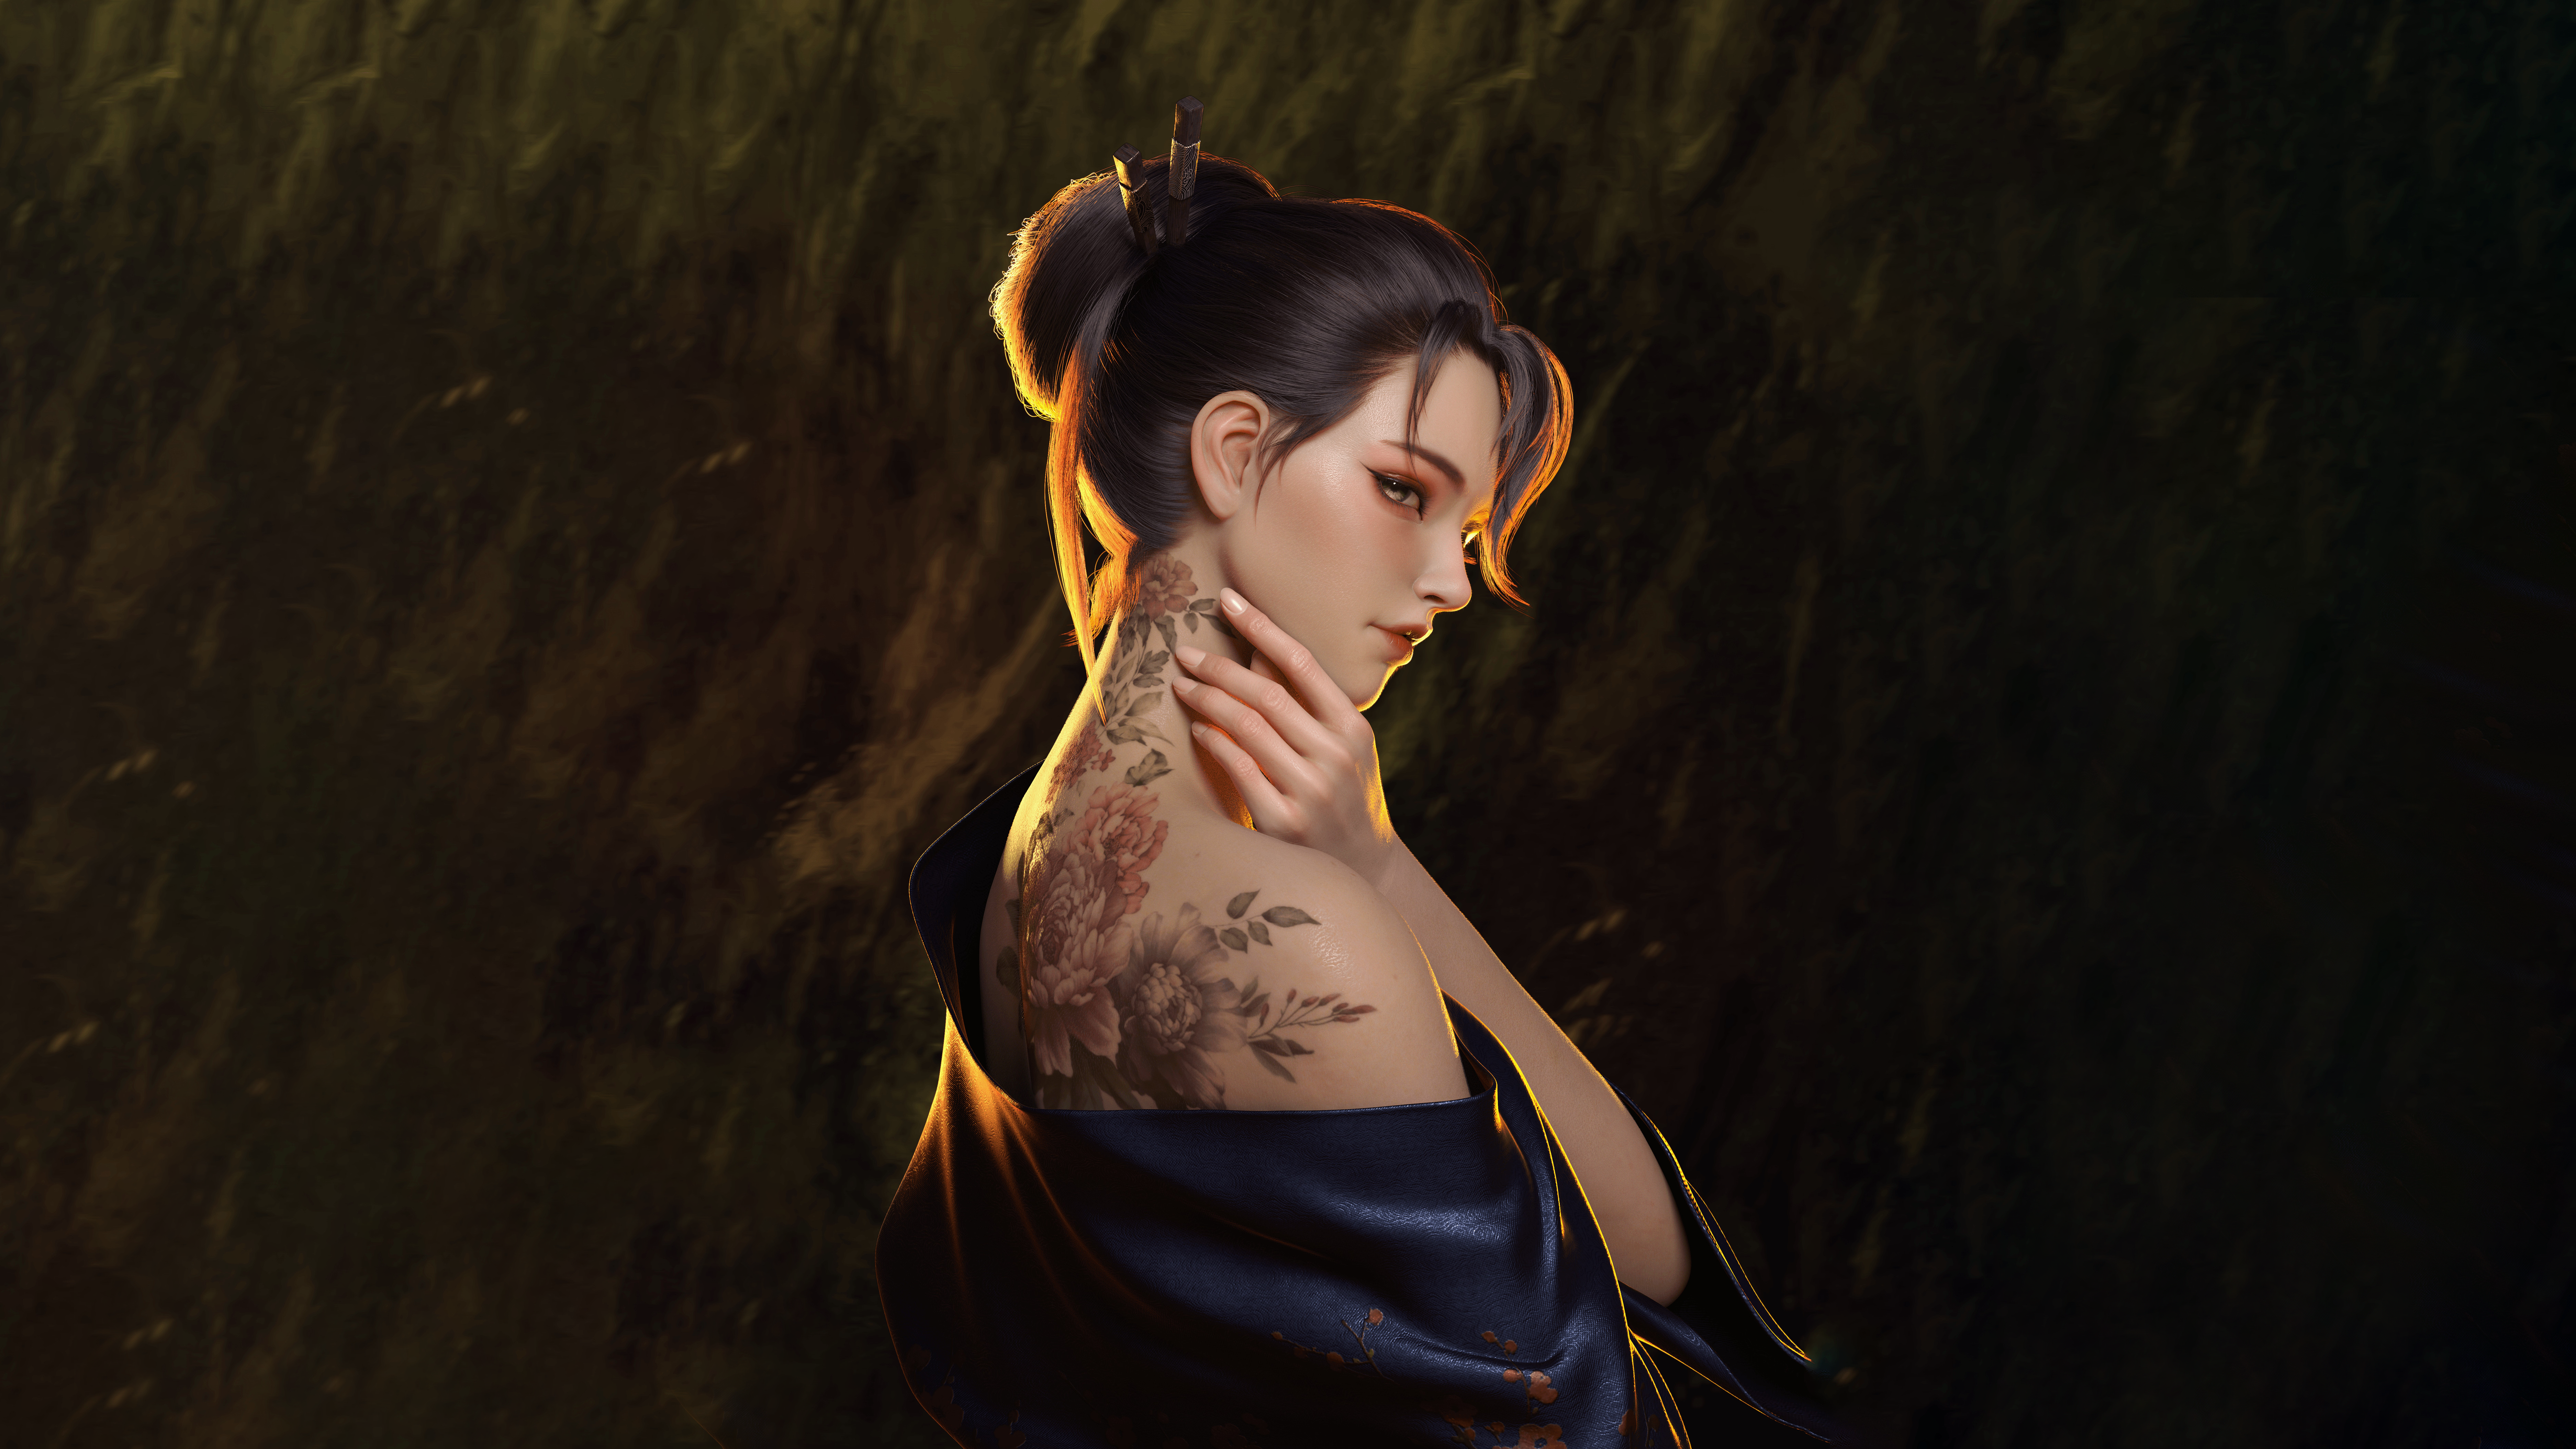 Anime 7498x4218 women digital art artwork dark hair inked girls back Asian simple background fantasy art fantasy girl Yihao Ren